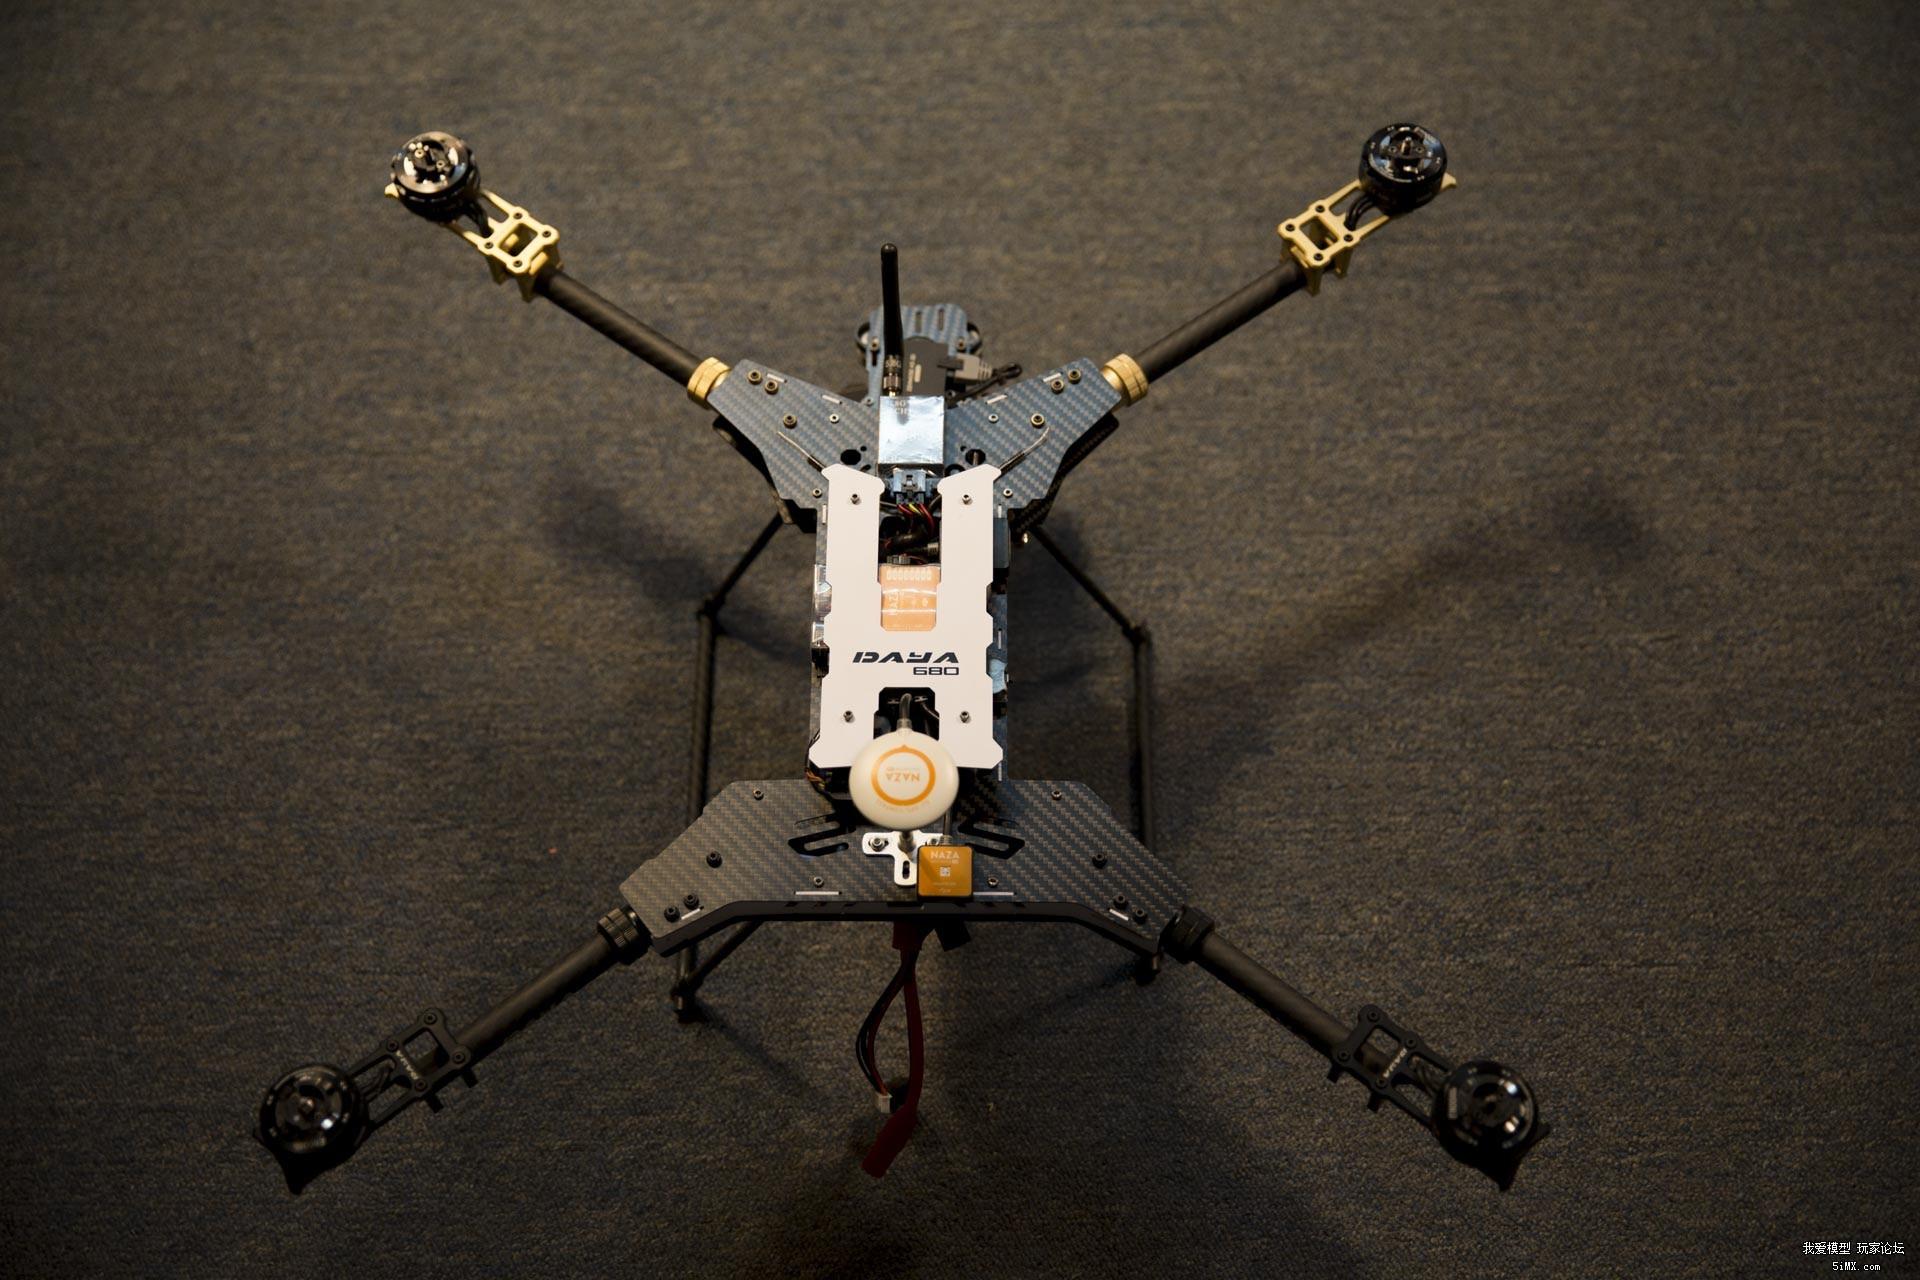 UAV H4 680 دايا للطي 4-محور ألياف الكربون Quadcopter الإطار w/الهبوط ل FPV